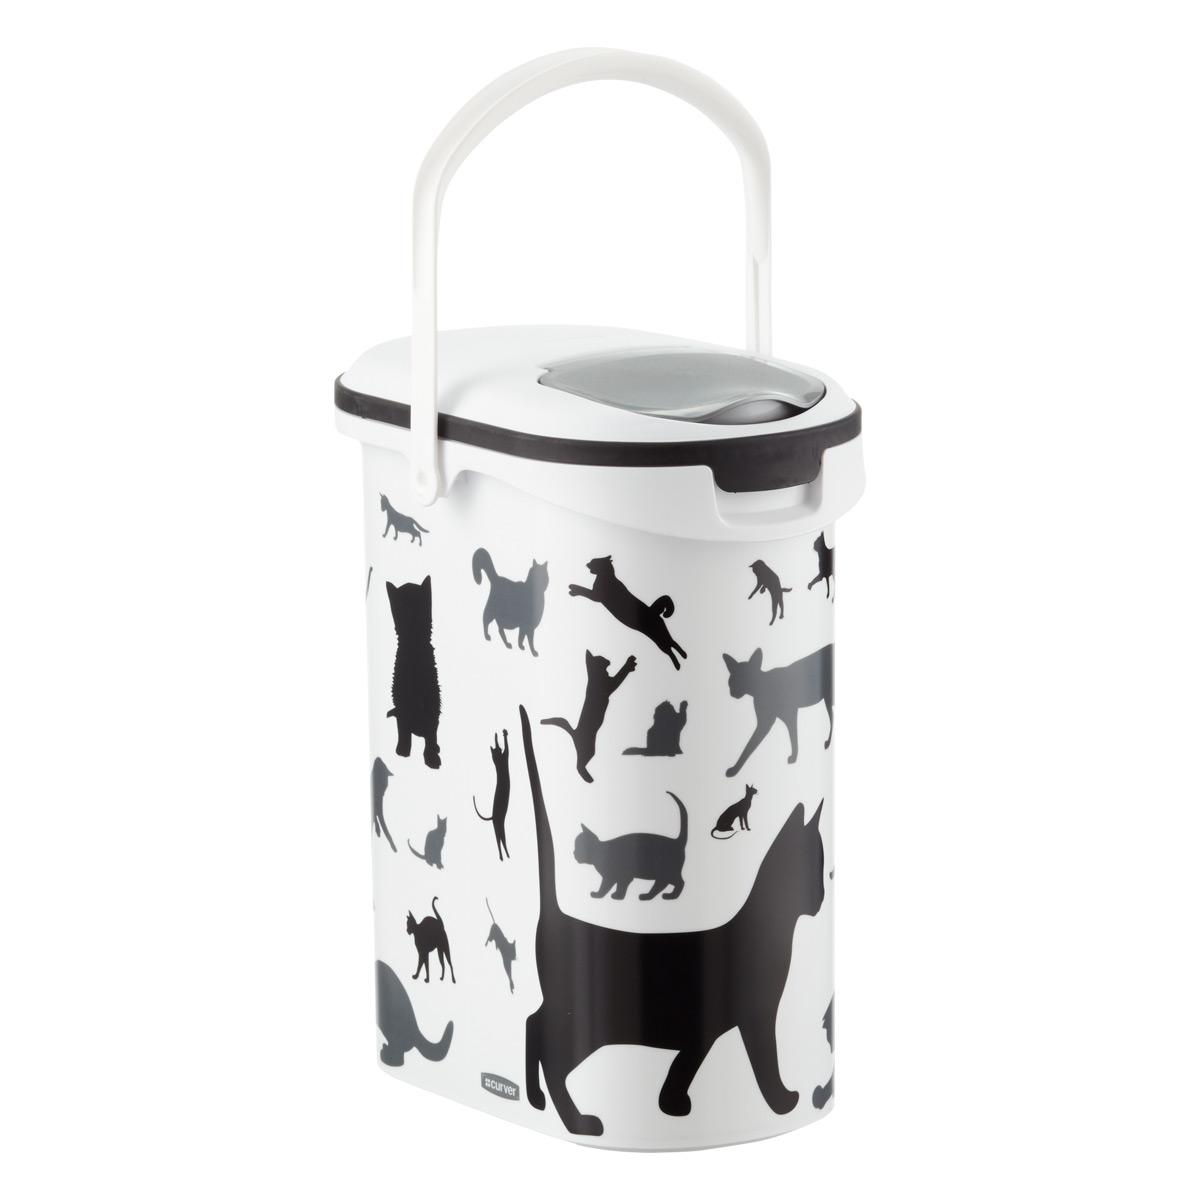 Pet Dry Food Container Cat